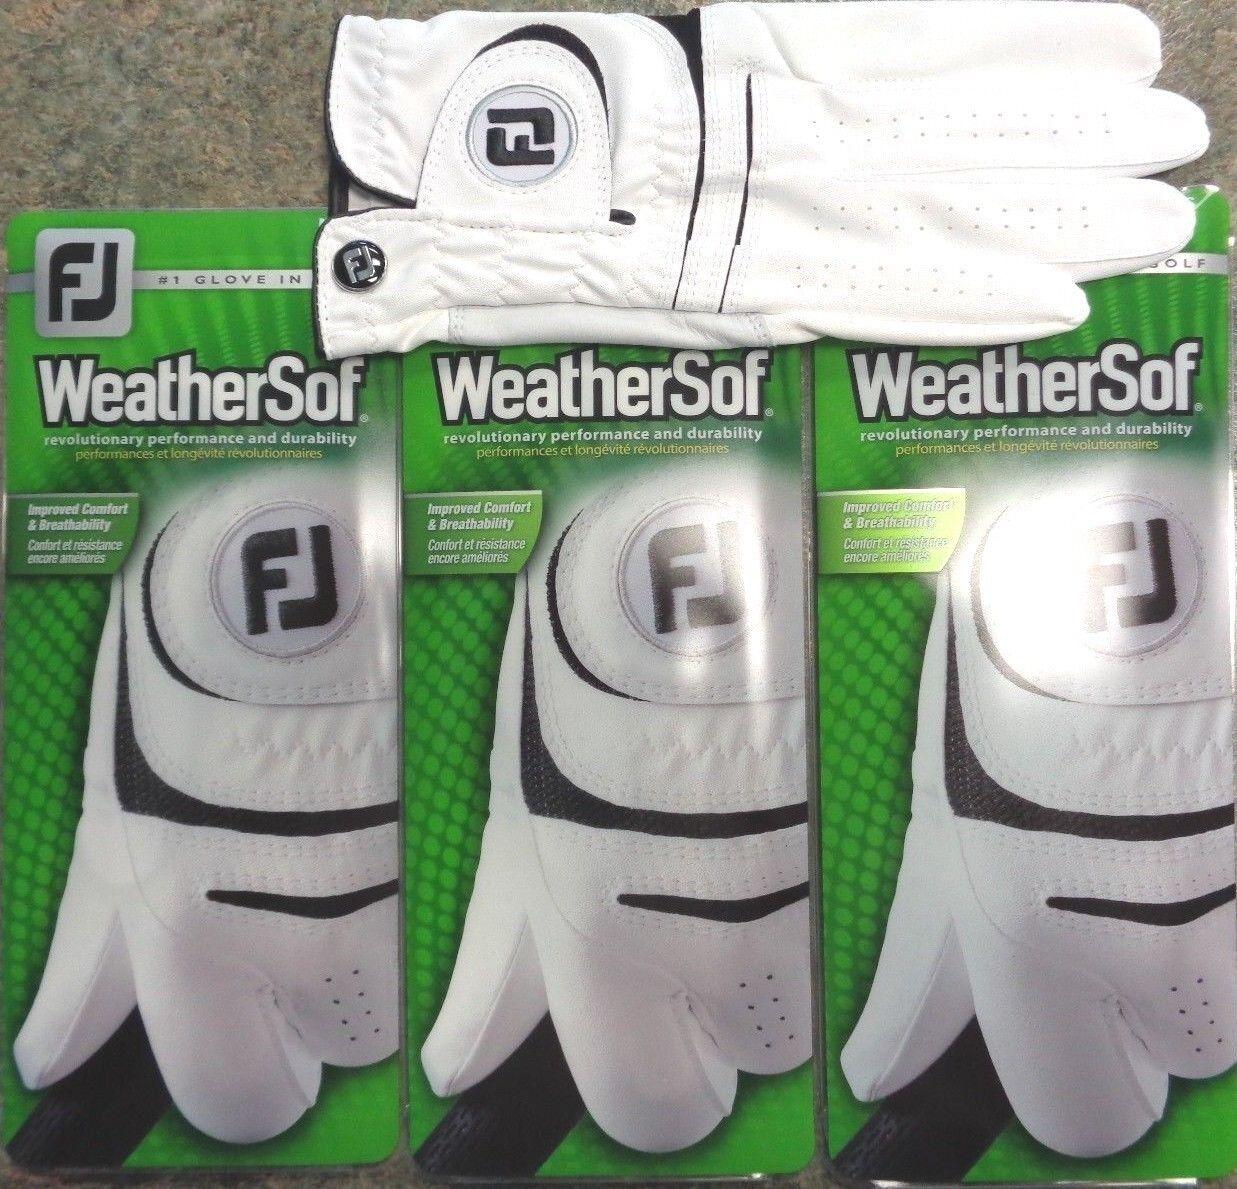 Купить THREE (3) NEW FootJoy WeatherSof Golf Gloves, PICK SIZE, #1 Glove in Golf, WHITE